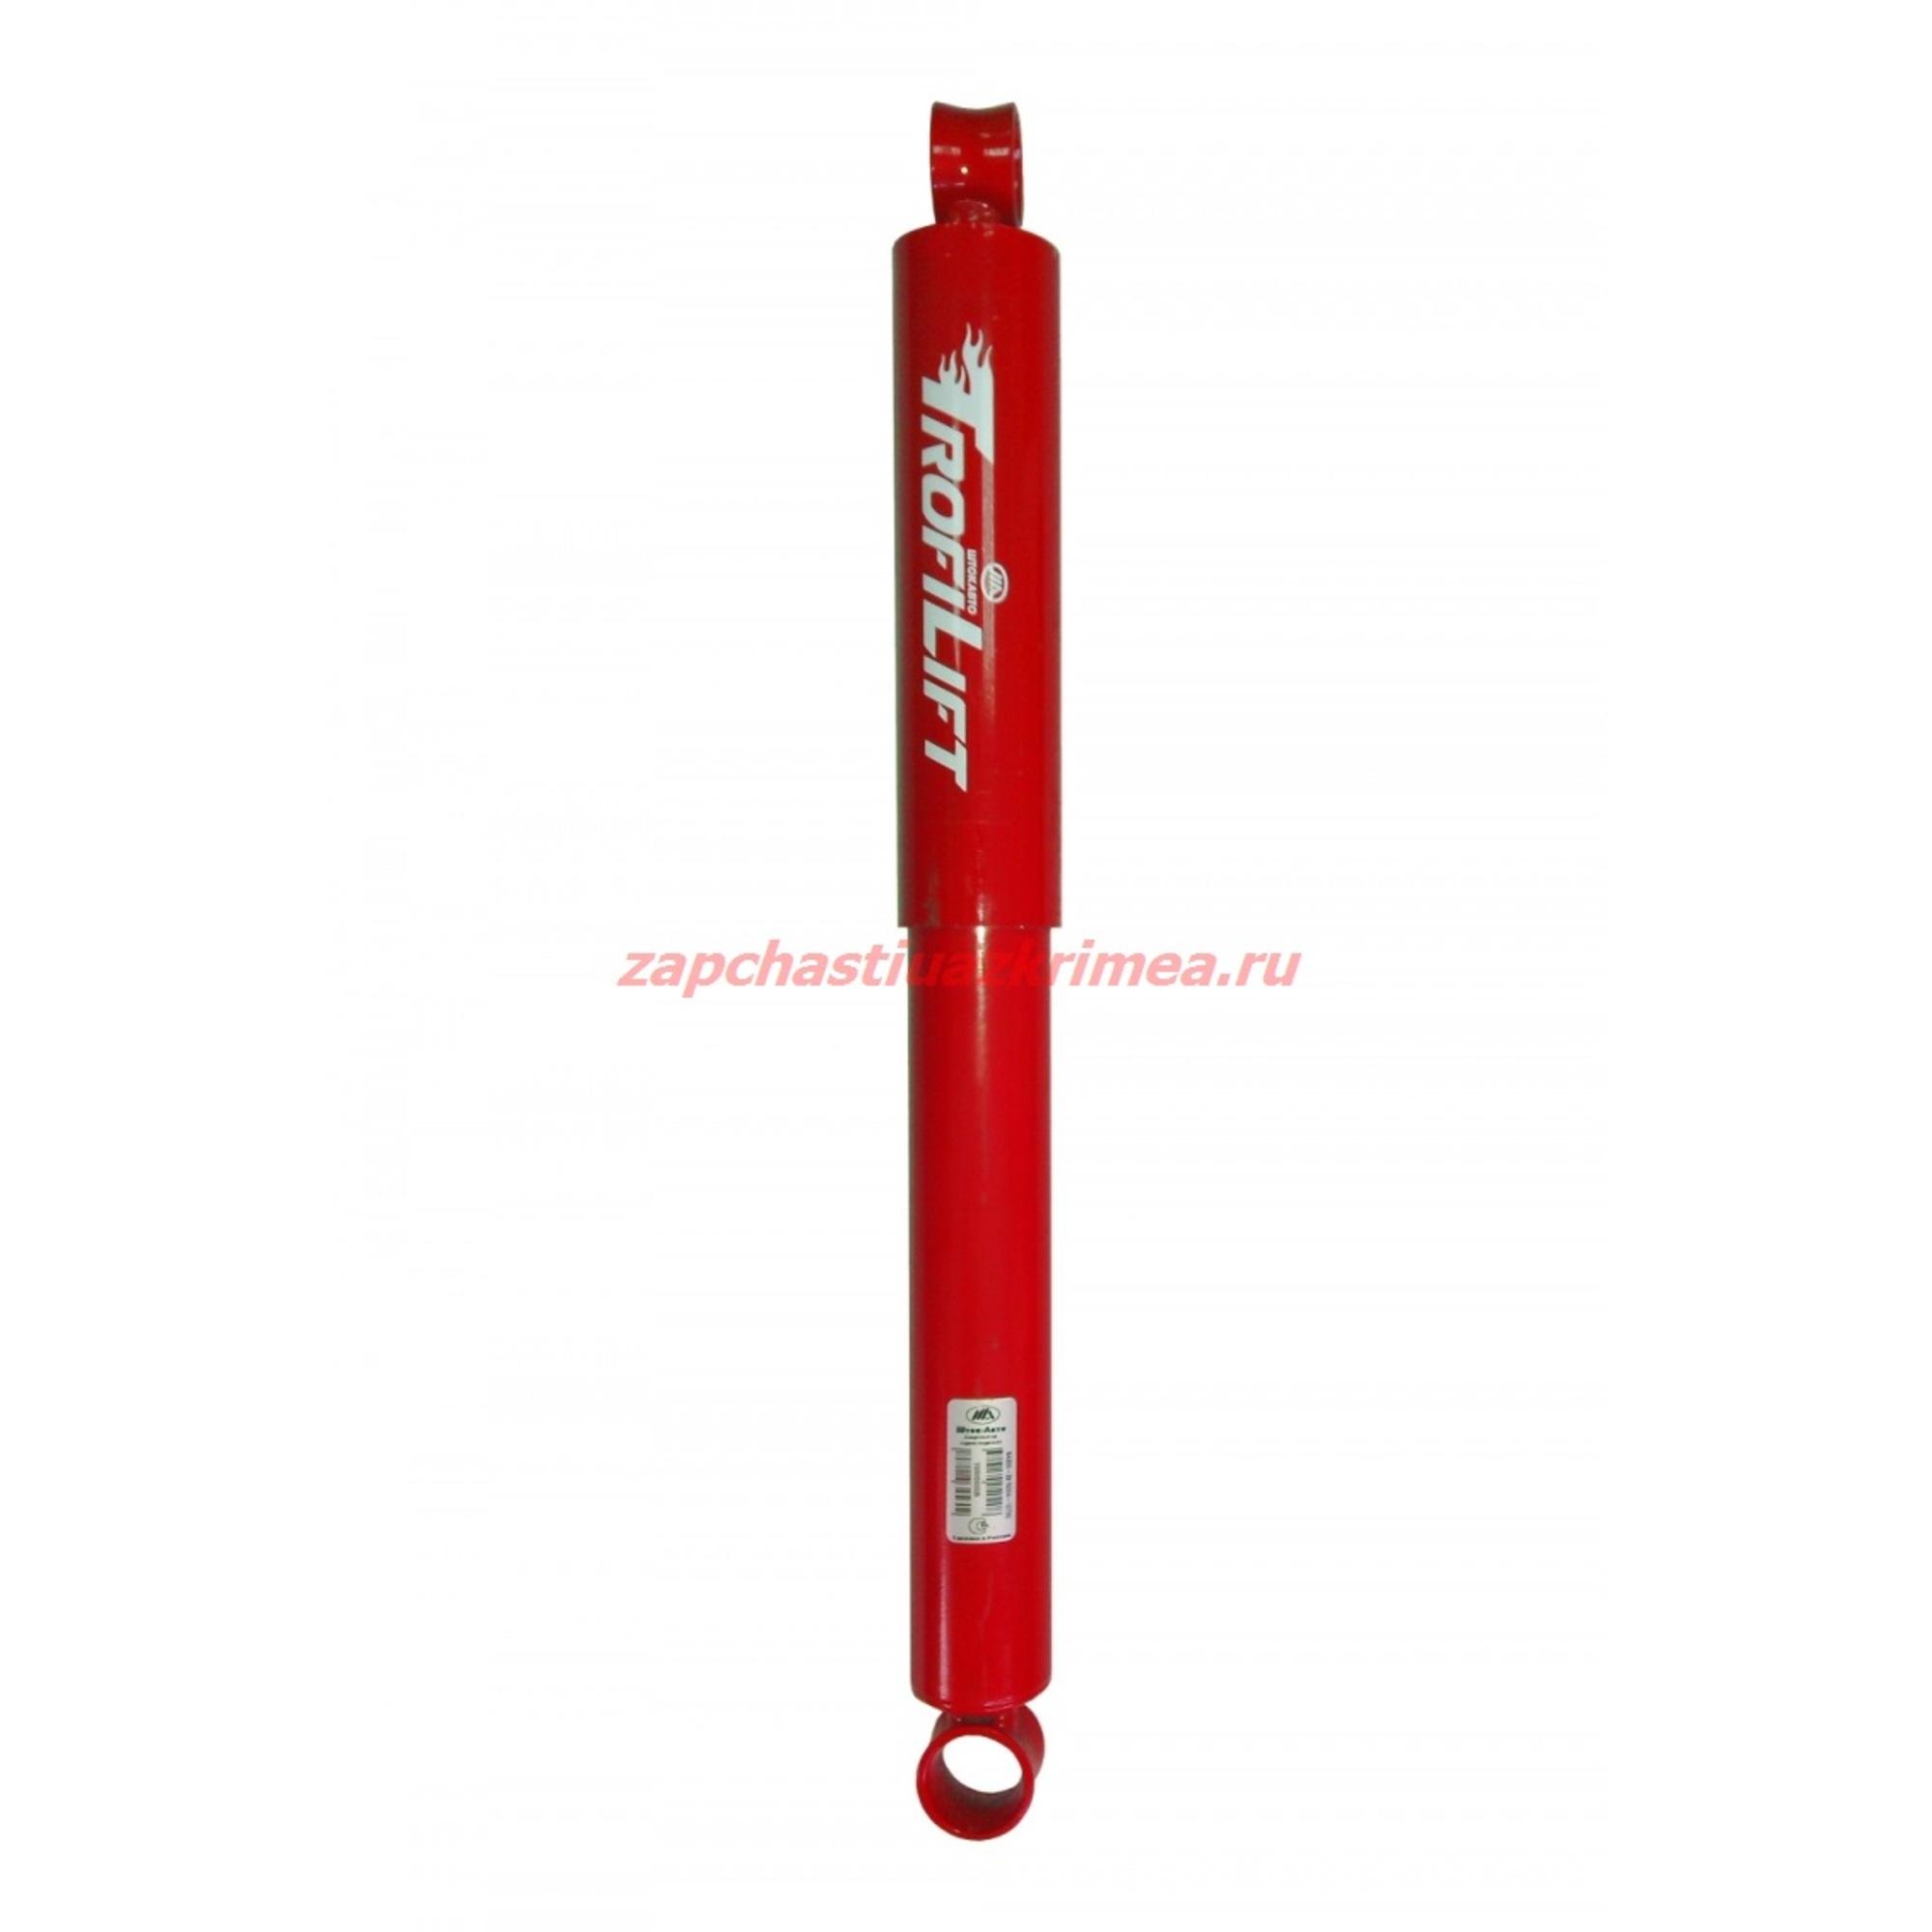 Амортизатор задний УАЗ 315195, 452 газ (378,5/583,5/215) лифт +30 мм Шток-Авто